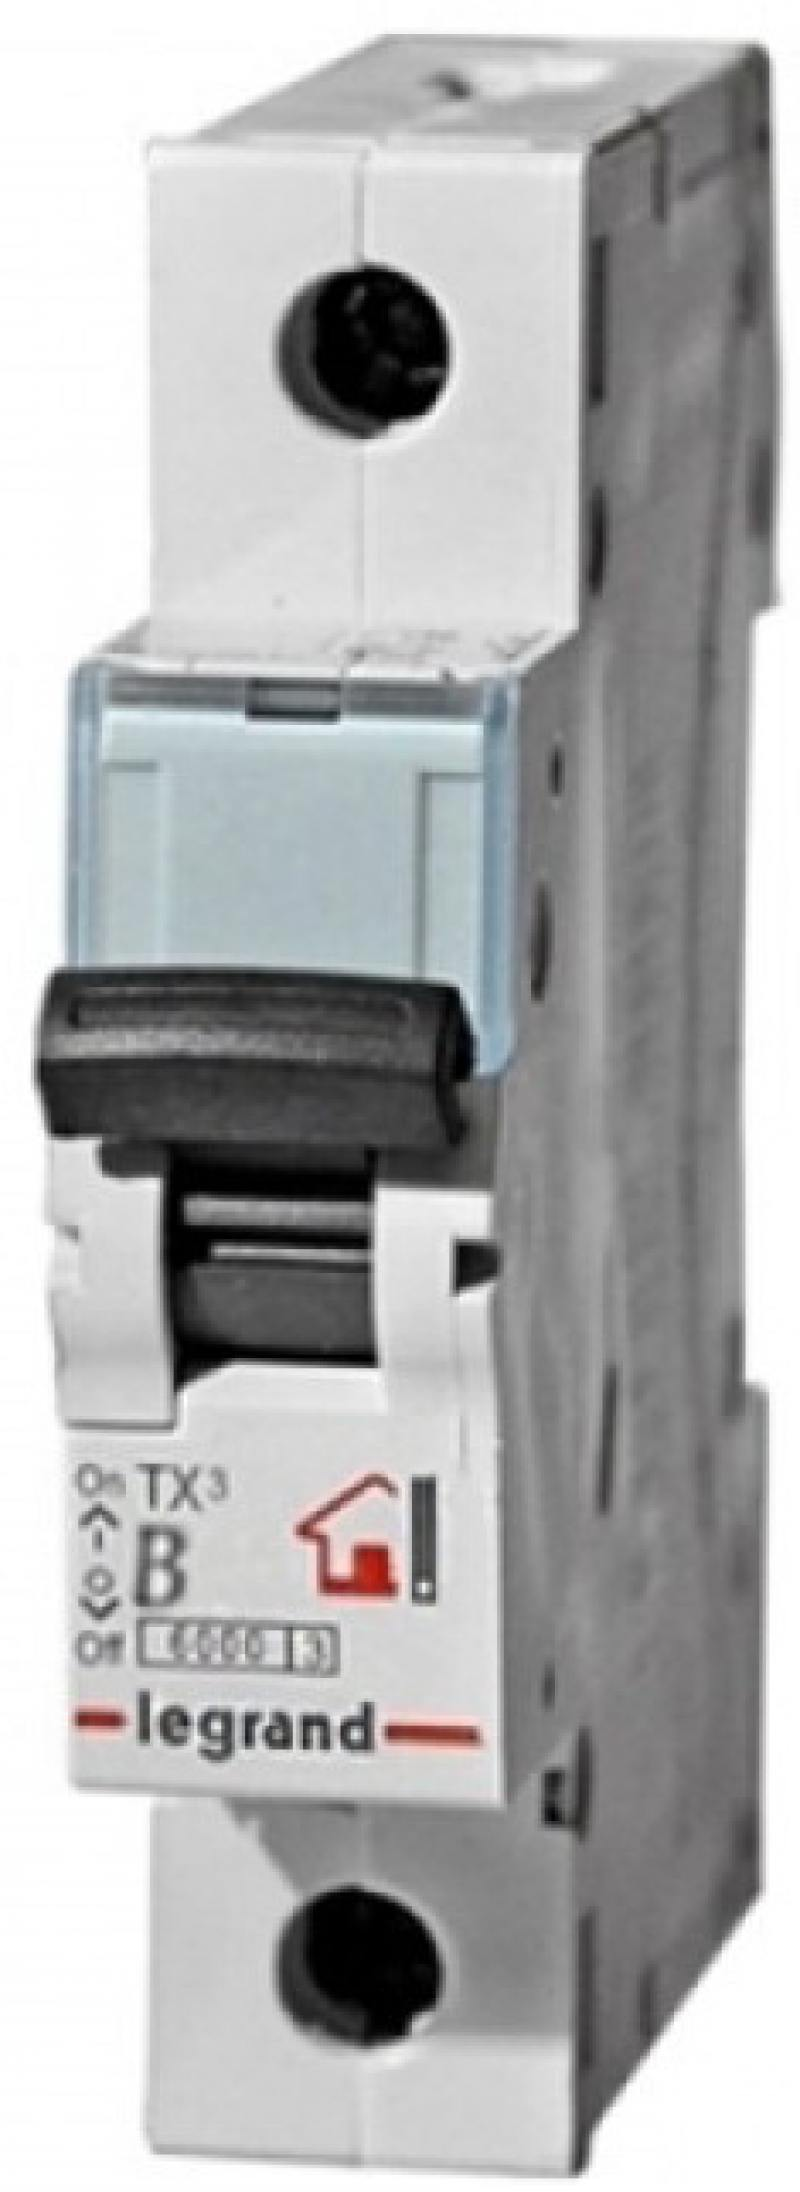 Автоматический выключатель Legrand TX3 6kA тип B 1П 25А 403974